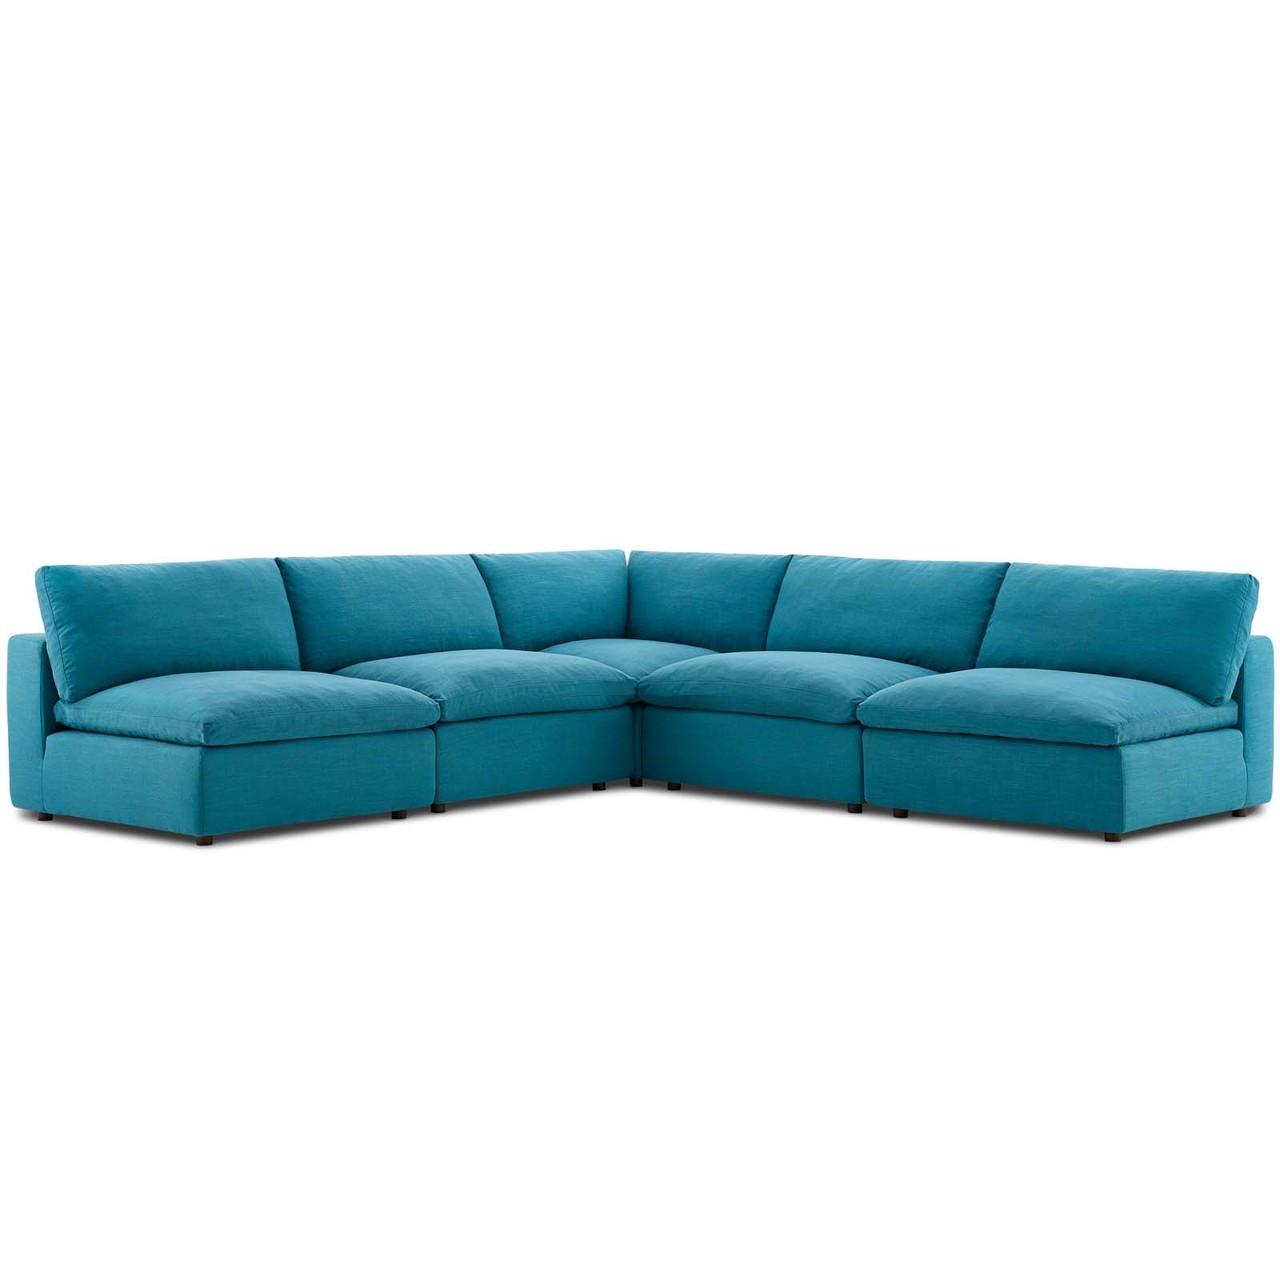 Commix Down Filled Overstuffed 5 Piece Sectional Sofa Set, Fabric, Aqua  Blue 15748